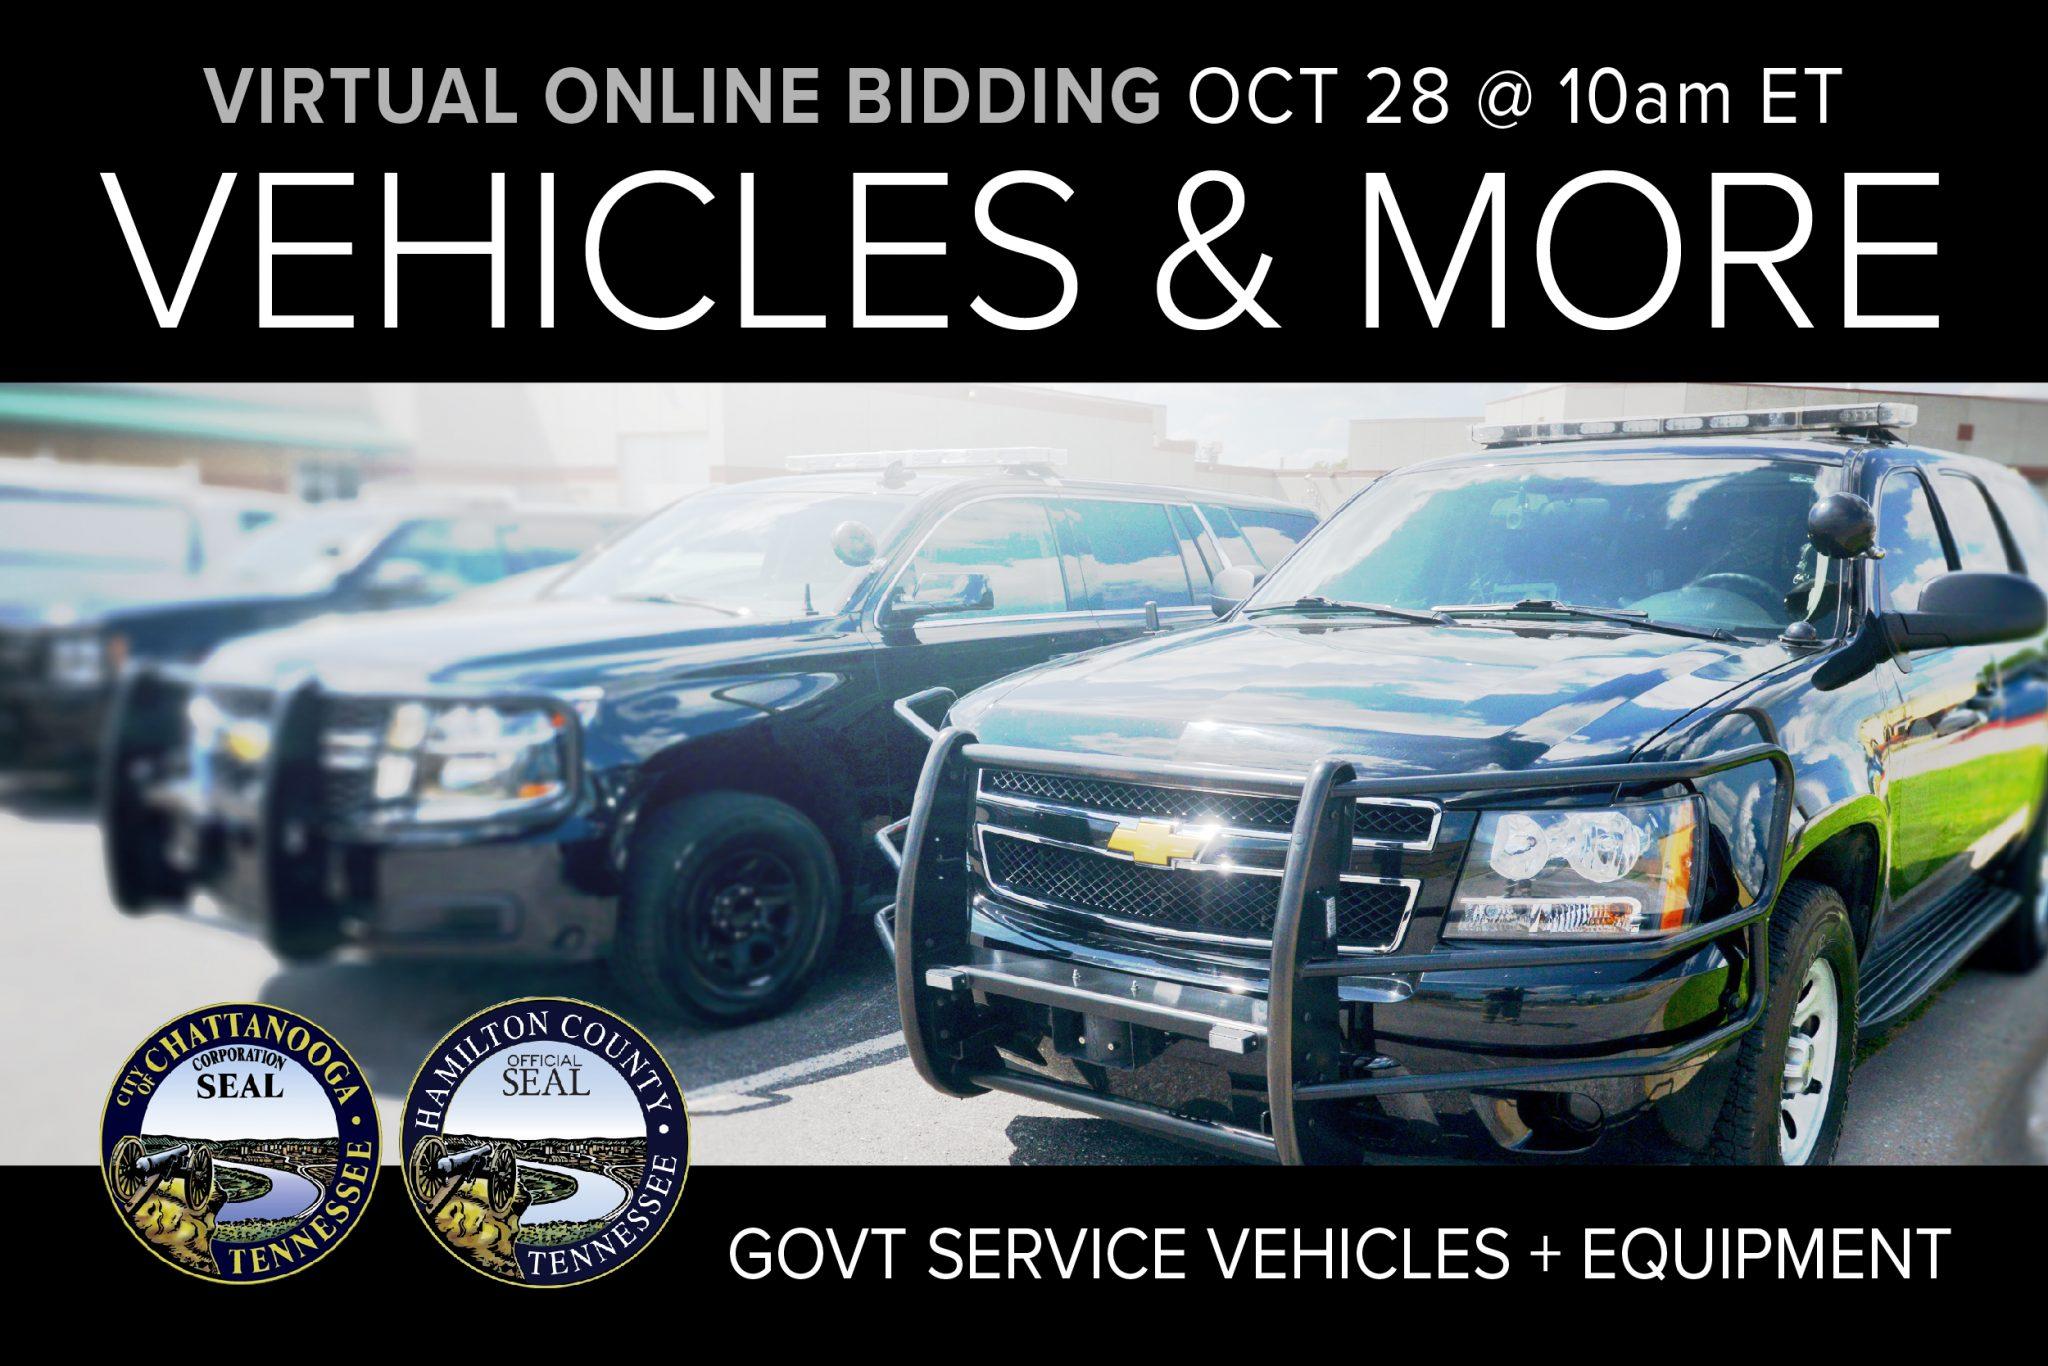 Compass October 2020 monthly public auction vehicles municipal surplus equipment tools